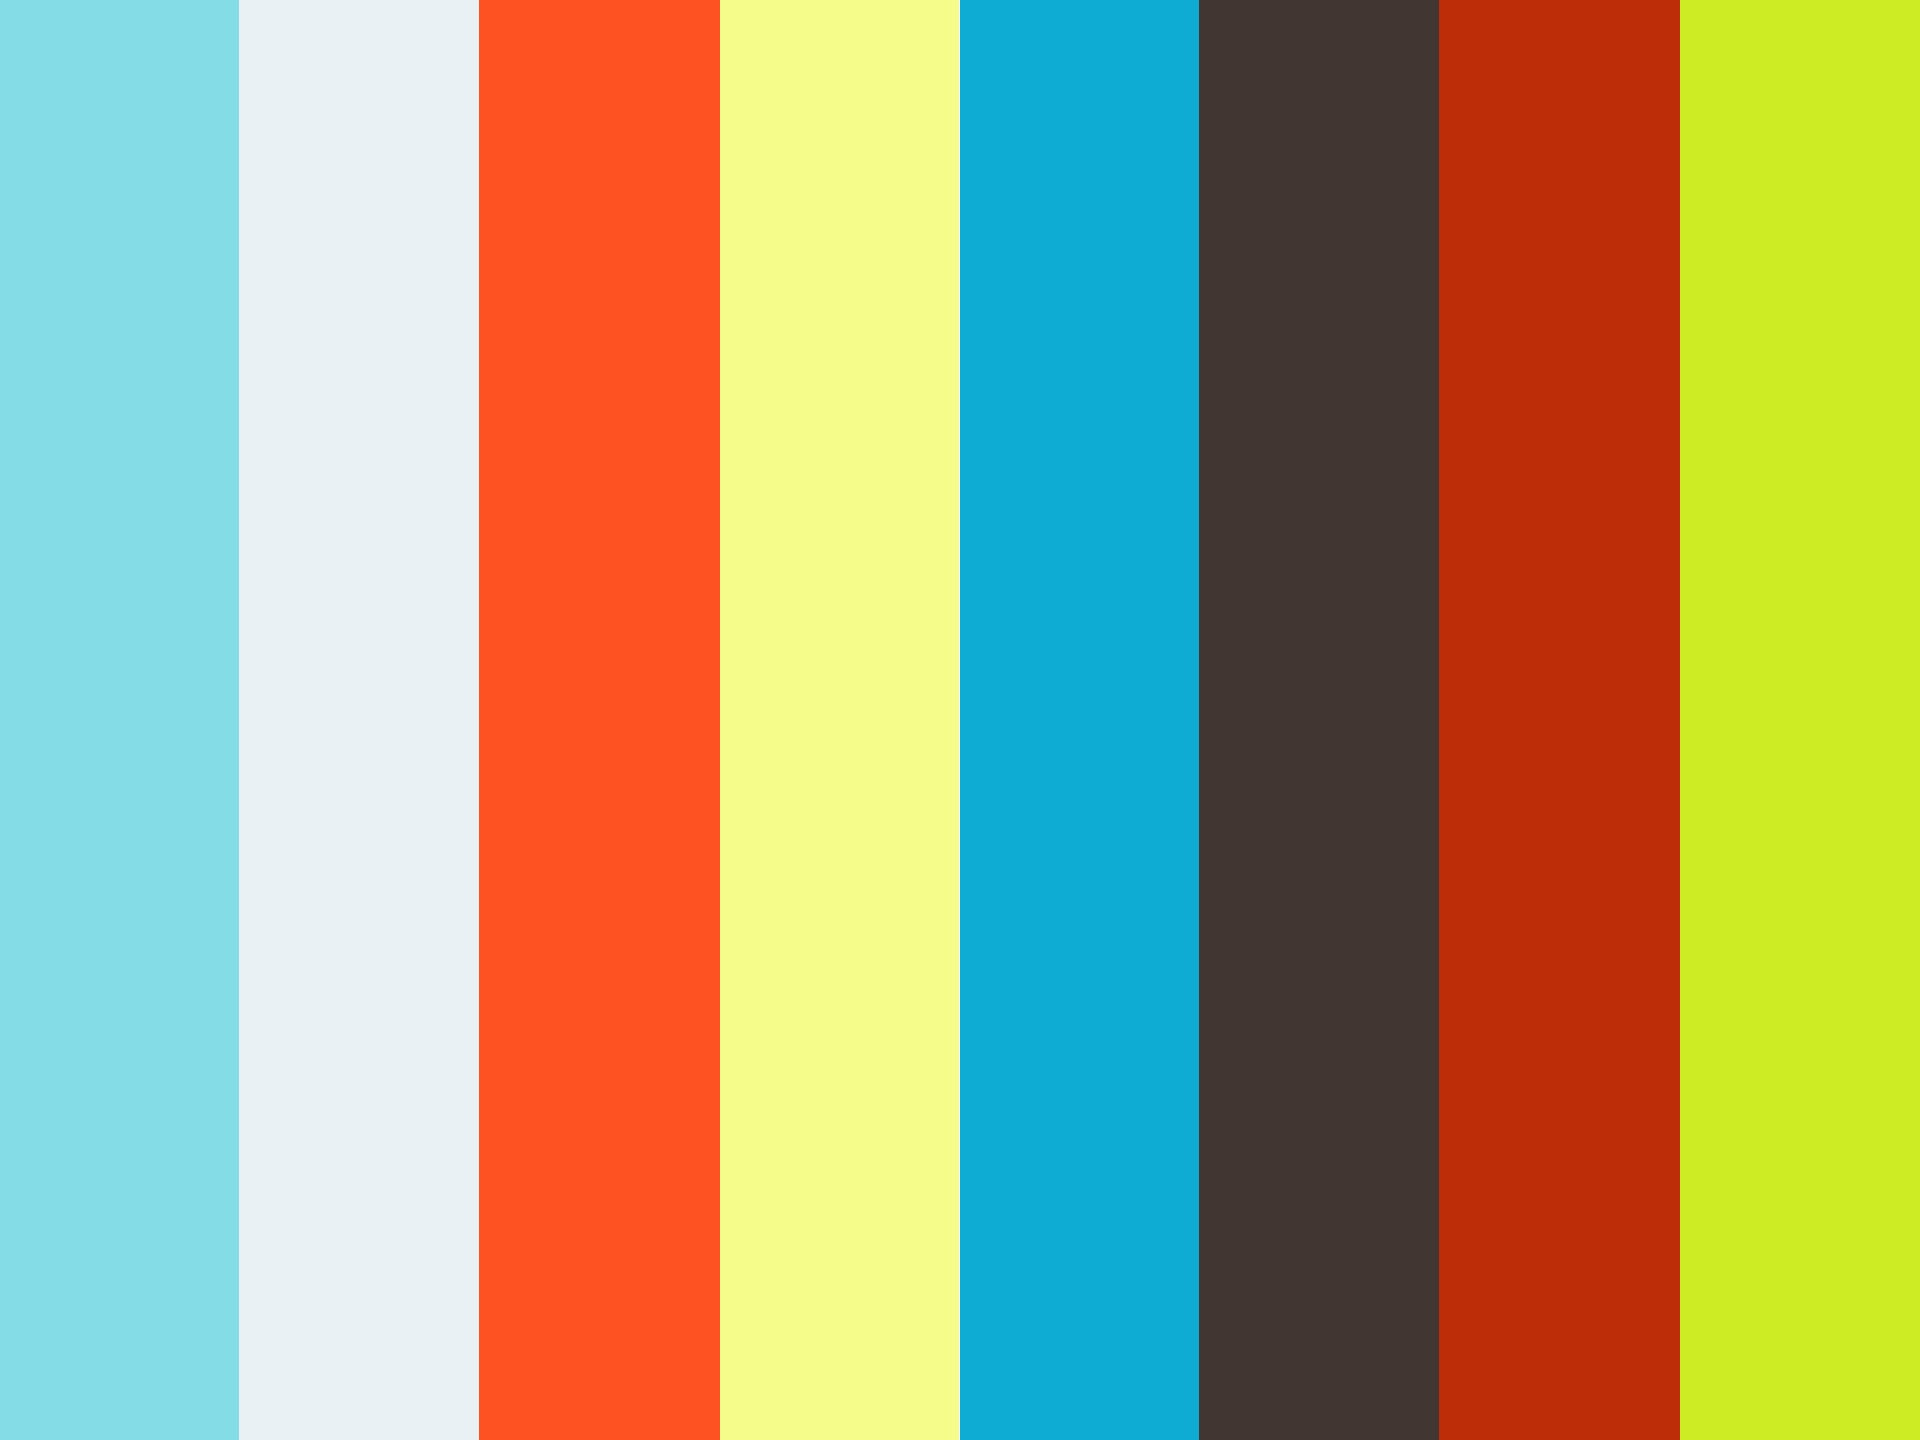 NEW! JEEP CHEROKEE - BLACK - 2020